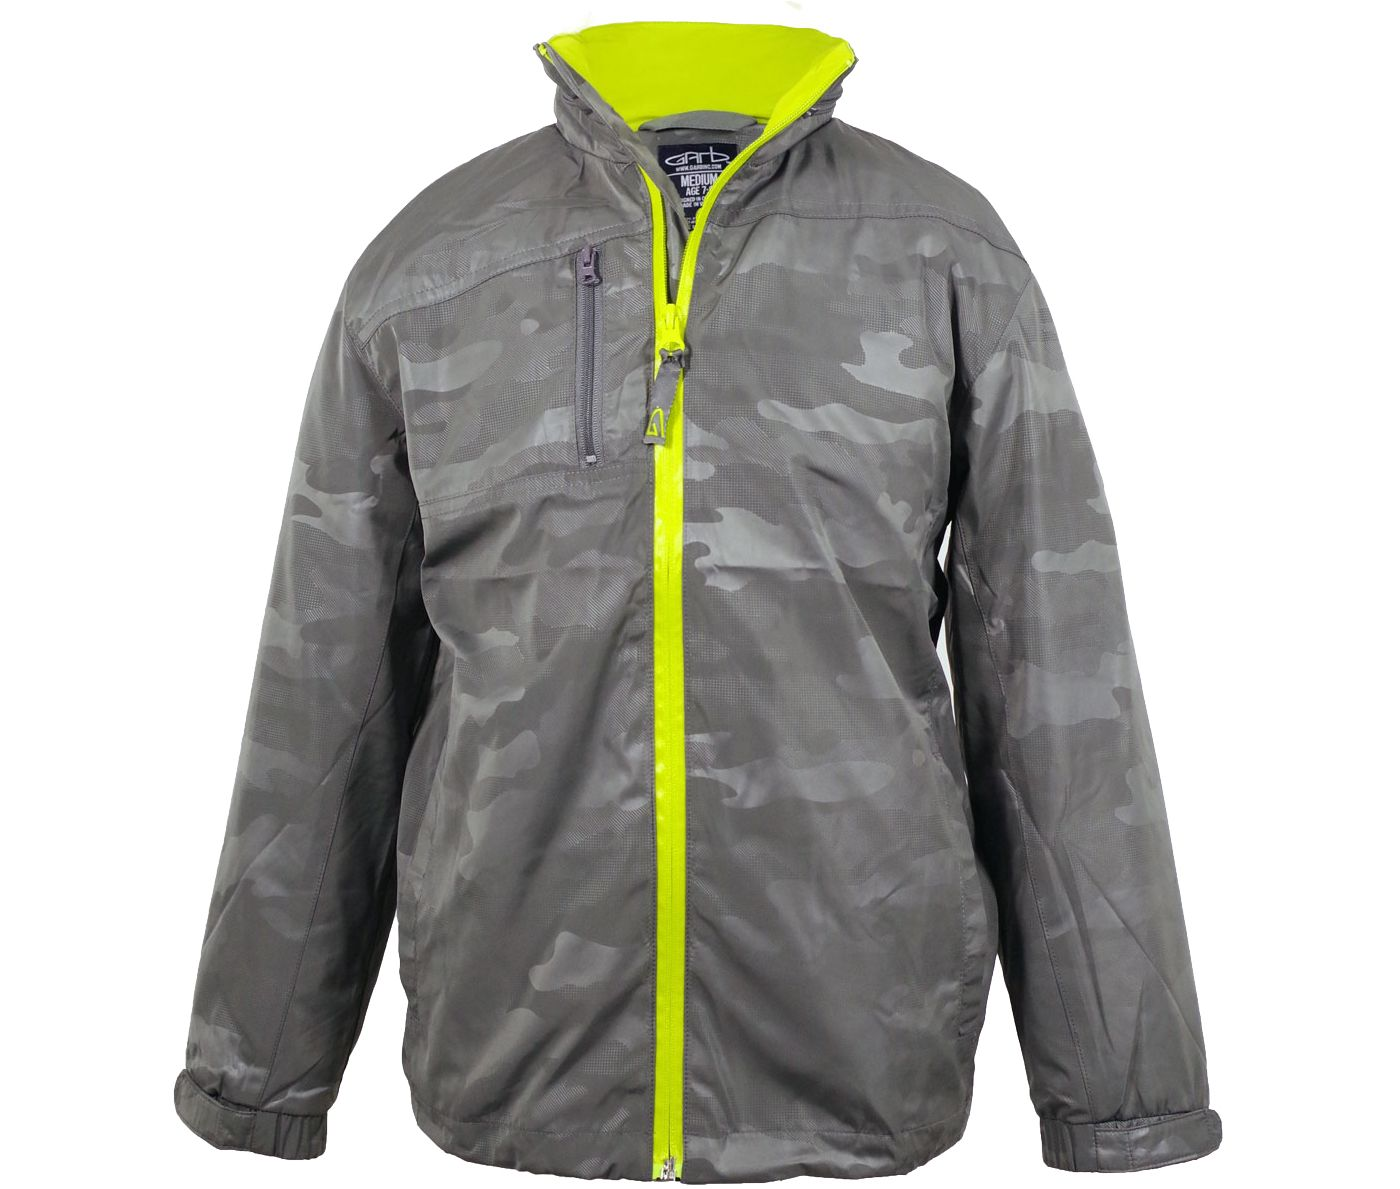 Garb Boys' Whitten Golf Rain Jacket